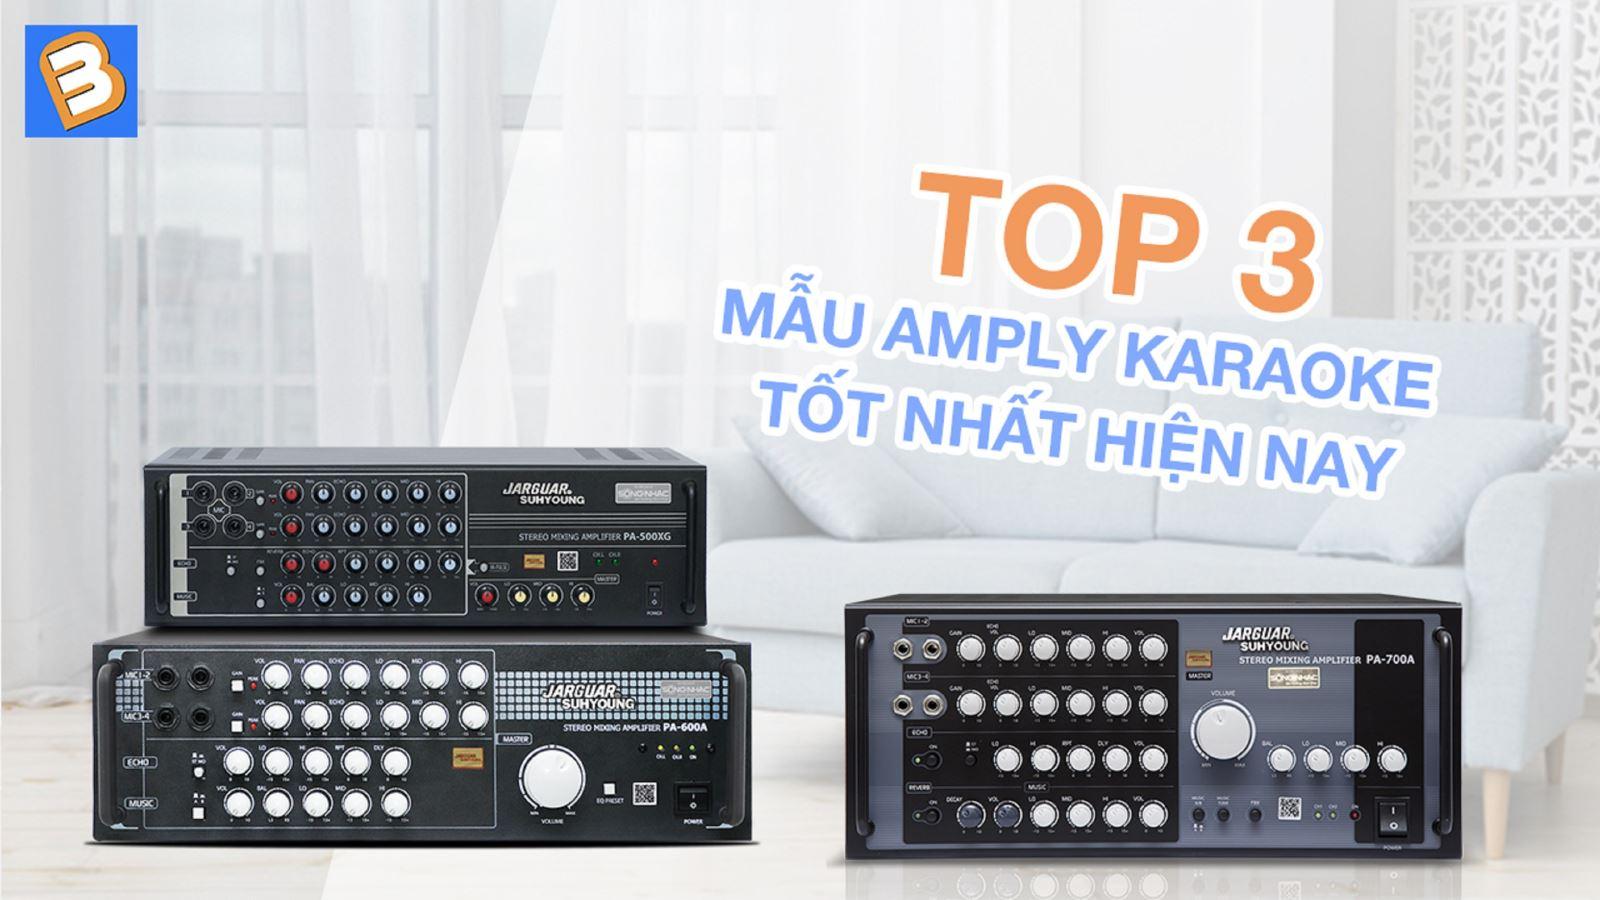 Top 3 mẫu amply karaoketốt nhất hiện nay